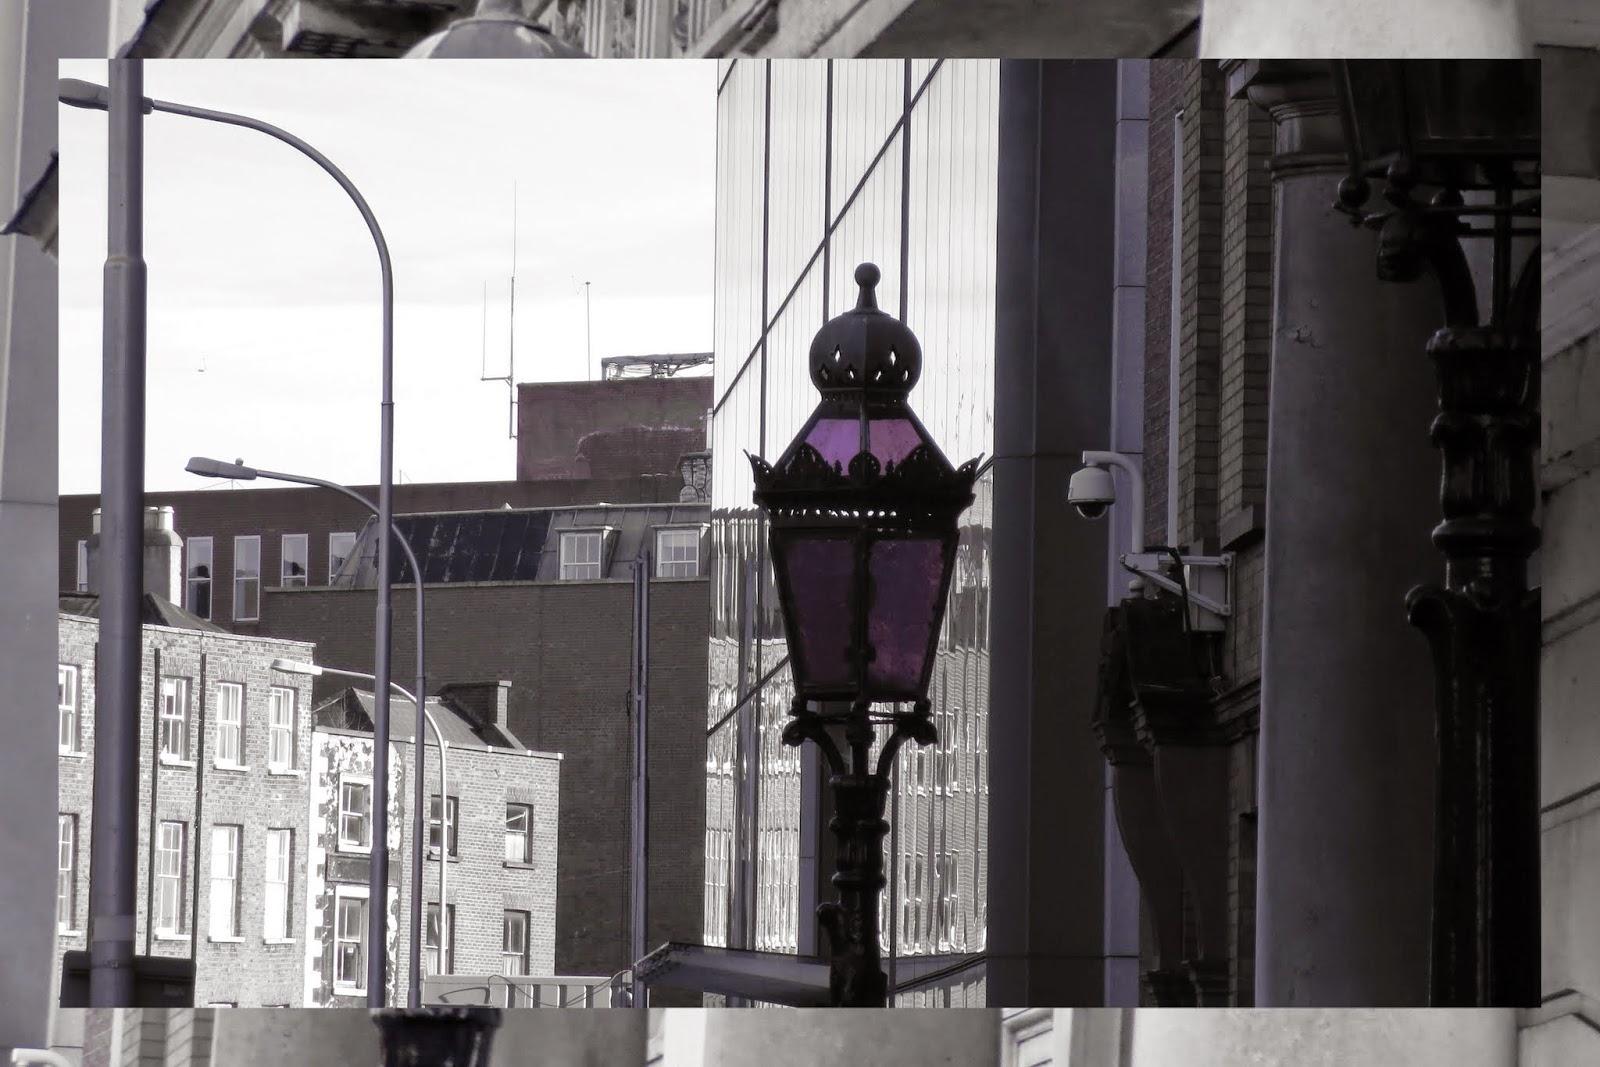 Iveagh House - Purple Lamps